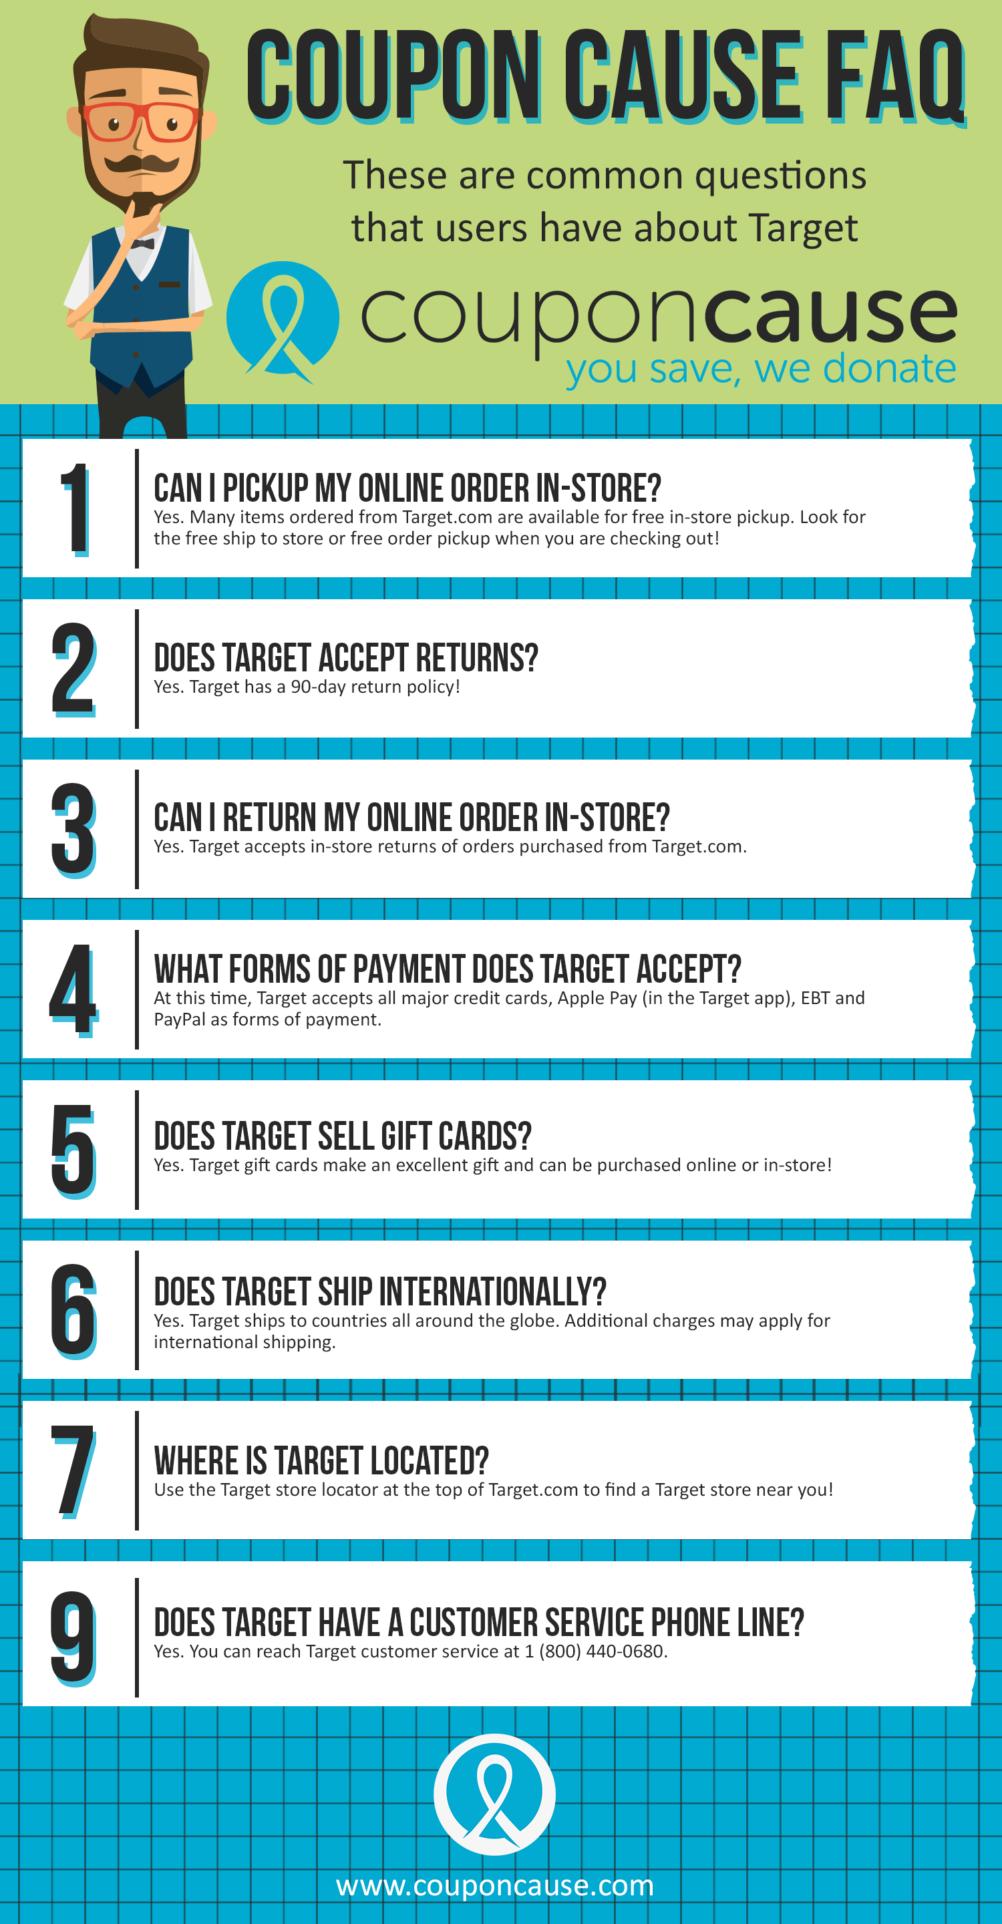 Target Coupon Cause FAQ (C.C. FAQ)